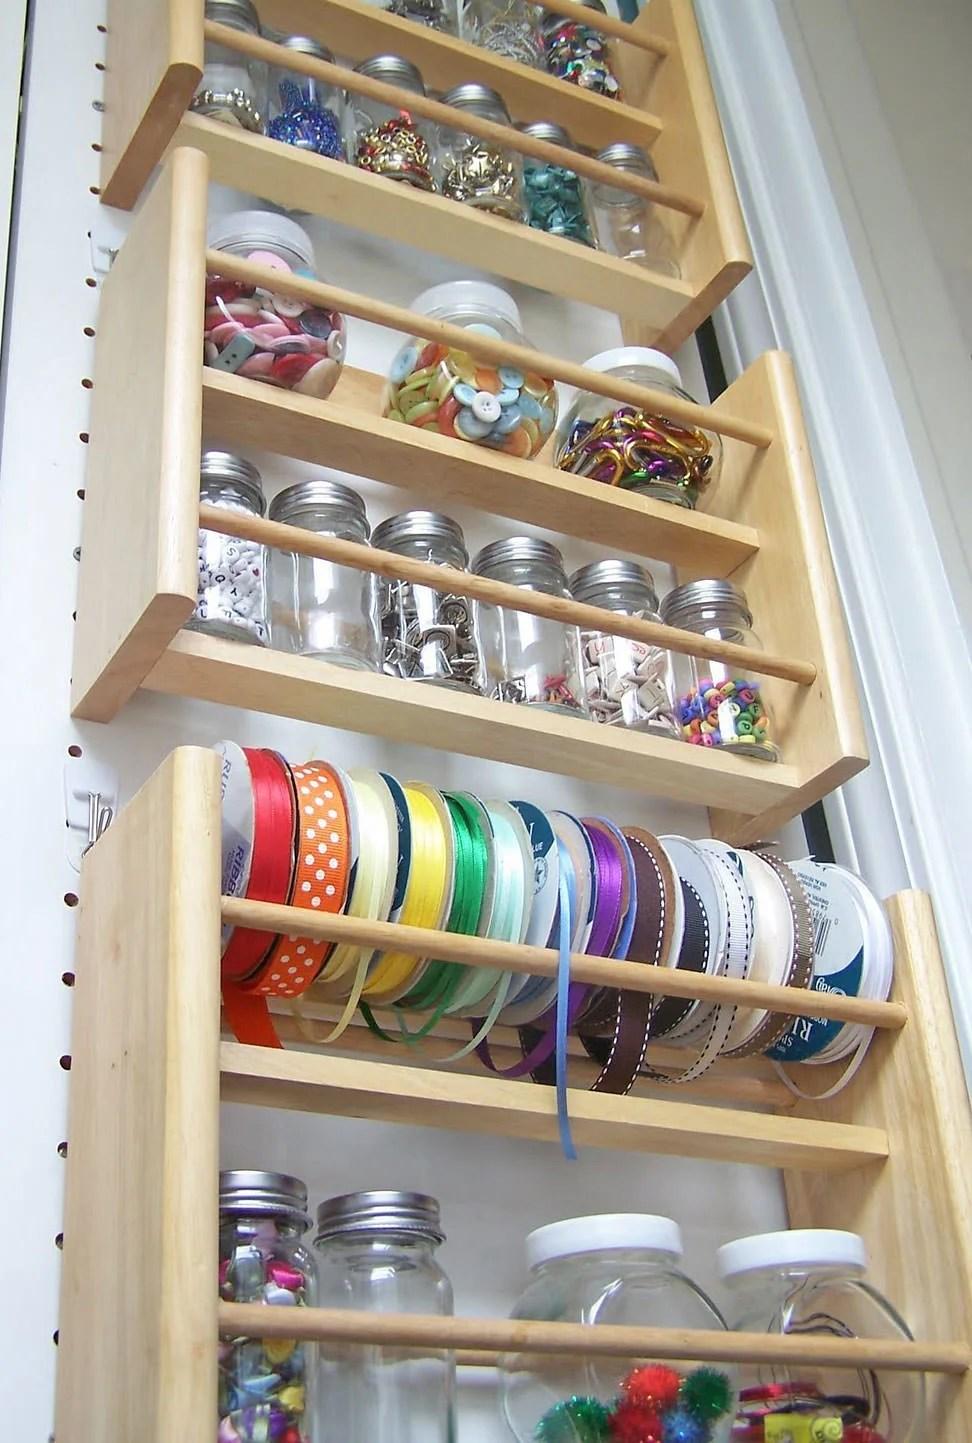 Best Kitchen Gallery: Diy Craft Room Ideas Projects The Budget Decorator of Room Ideas Diy  on rachelxblog.com